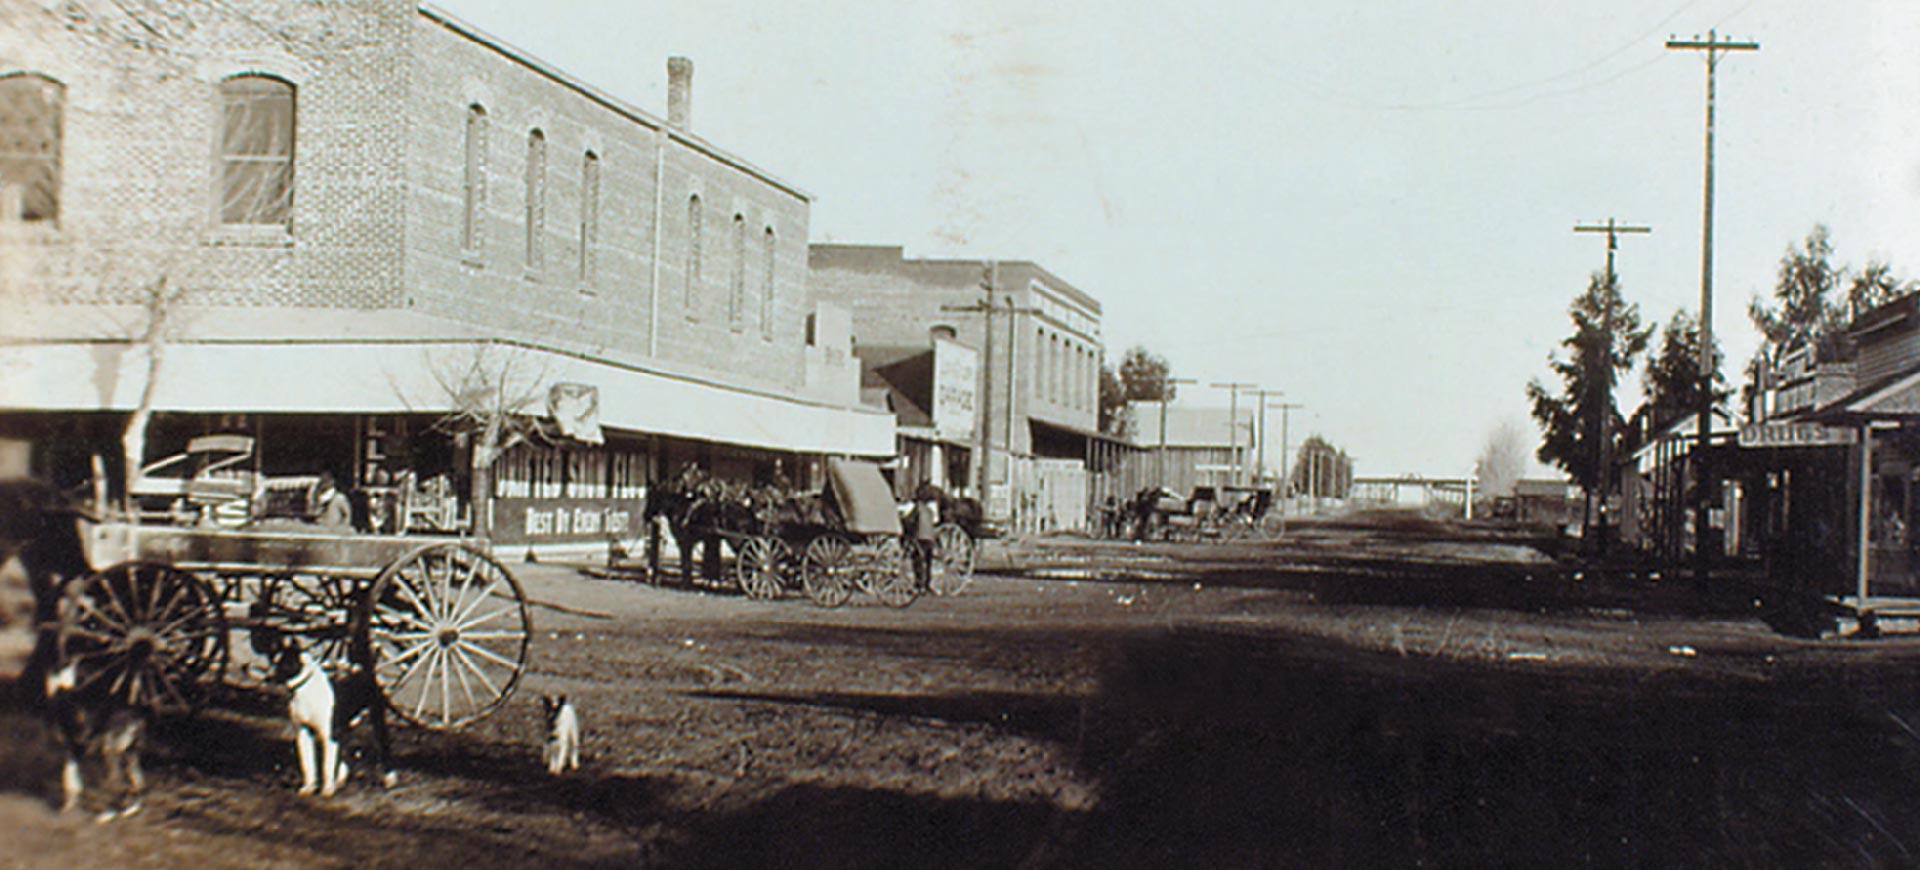 Old-Town-Clovis-Fifth-Street